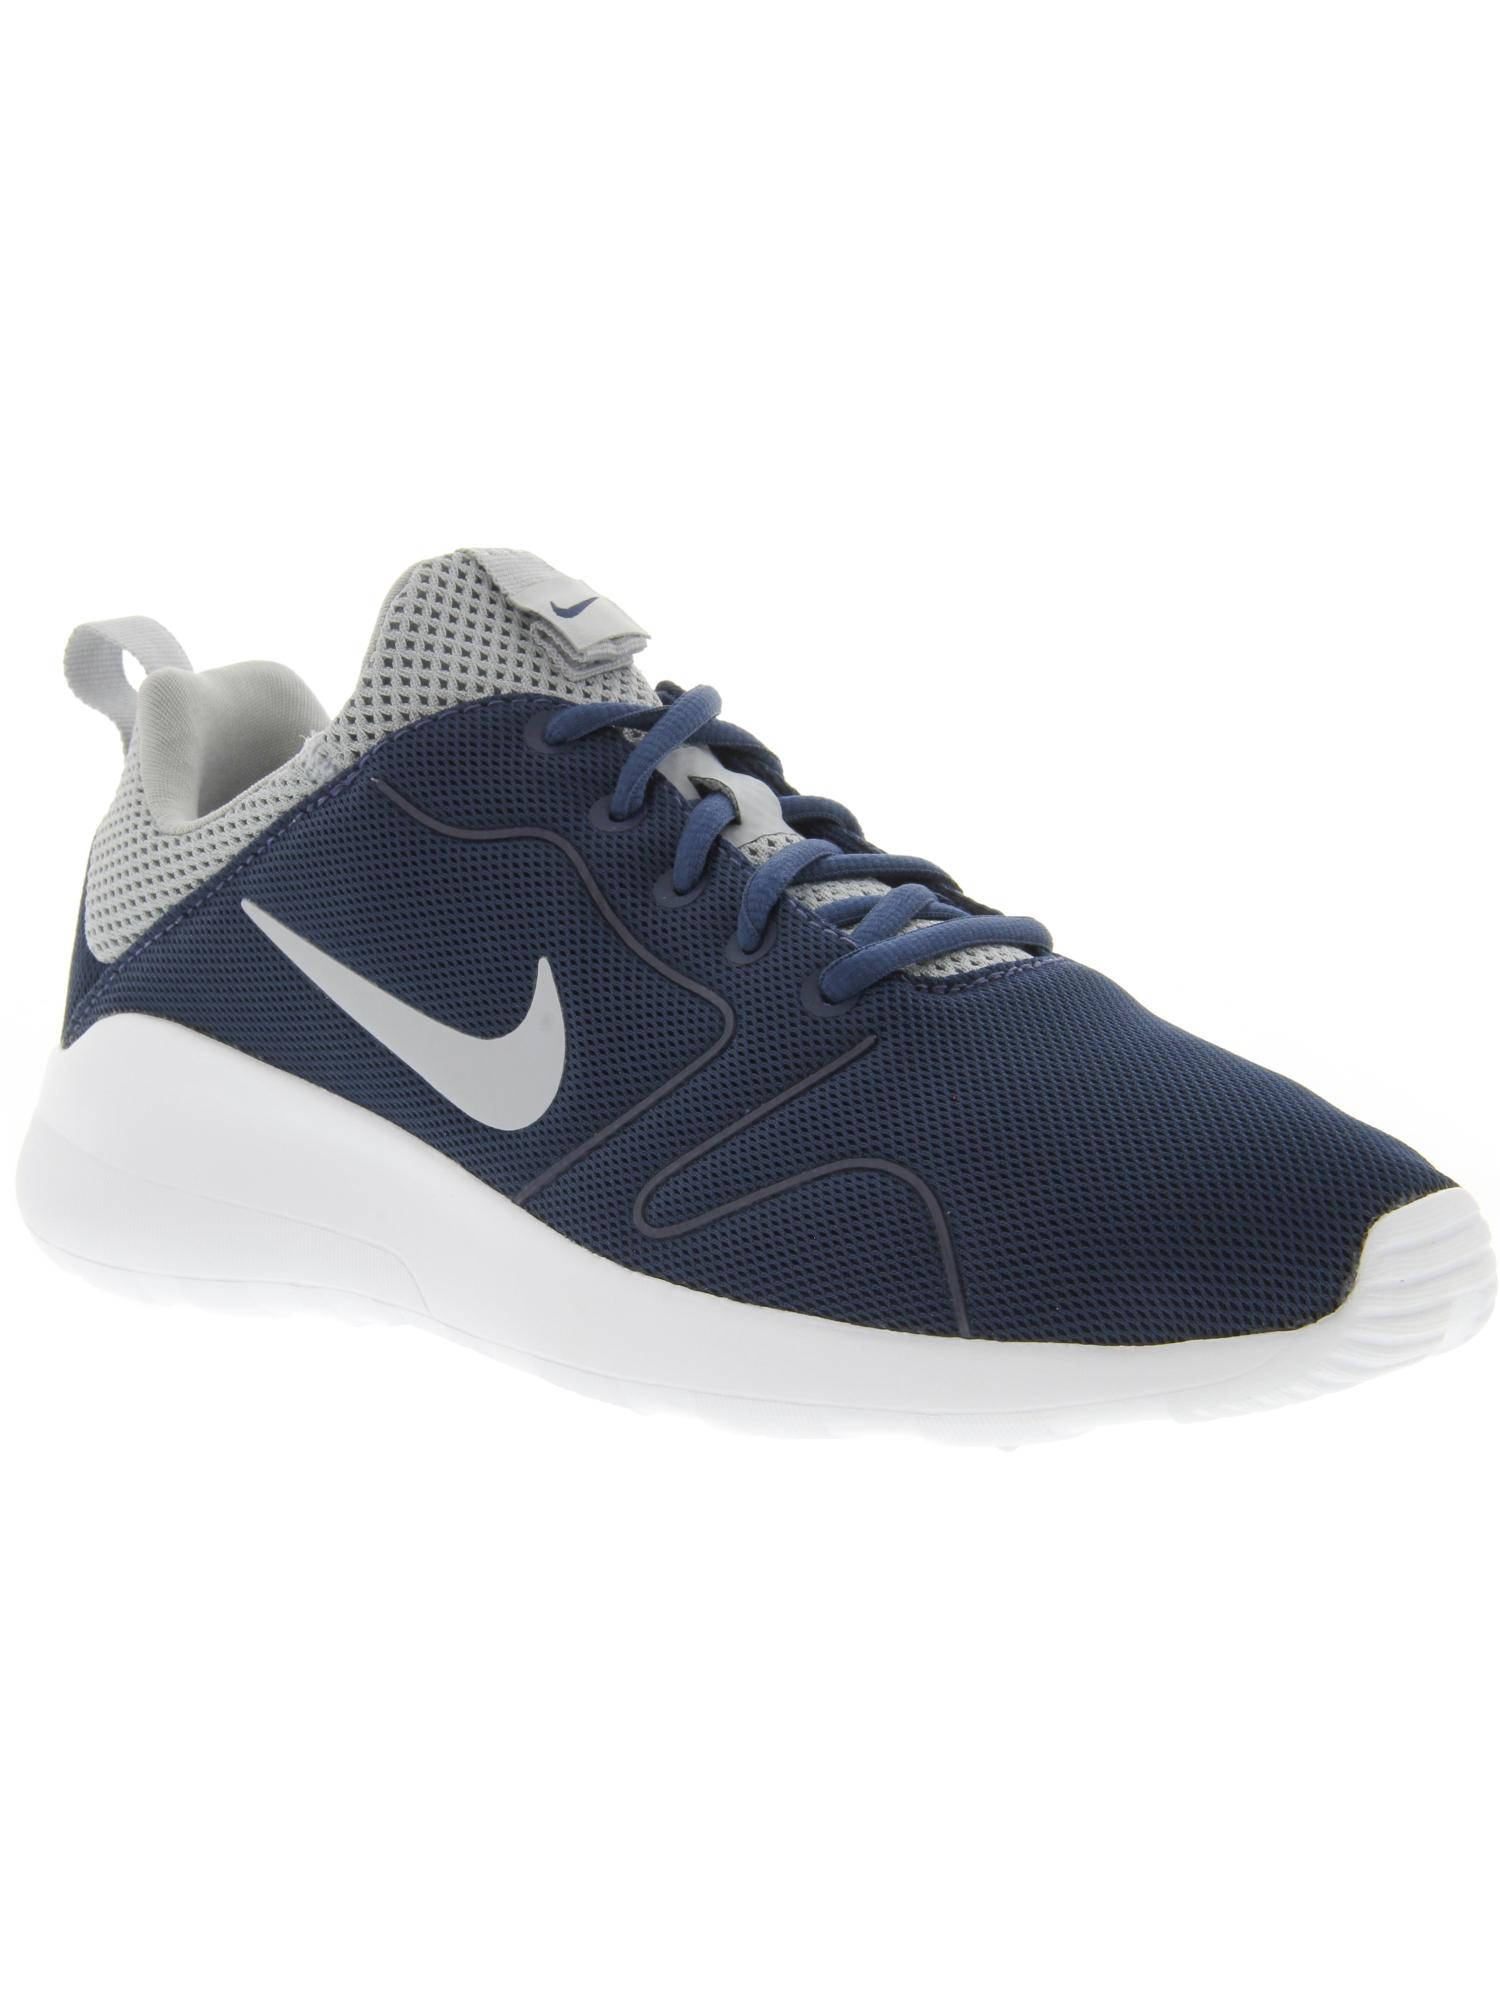 6adf8b2726ce ... Nike Men s Men s Men s Kaishi 2.0 Ankle-High Walking Shoe d7cfdd ...